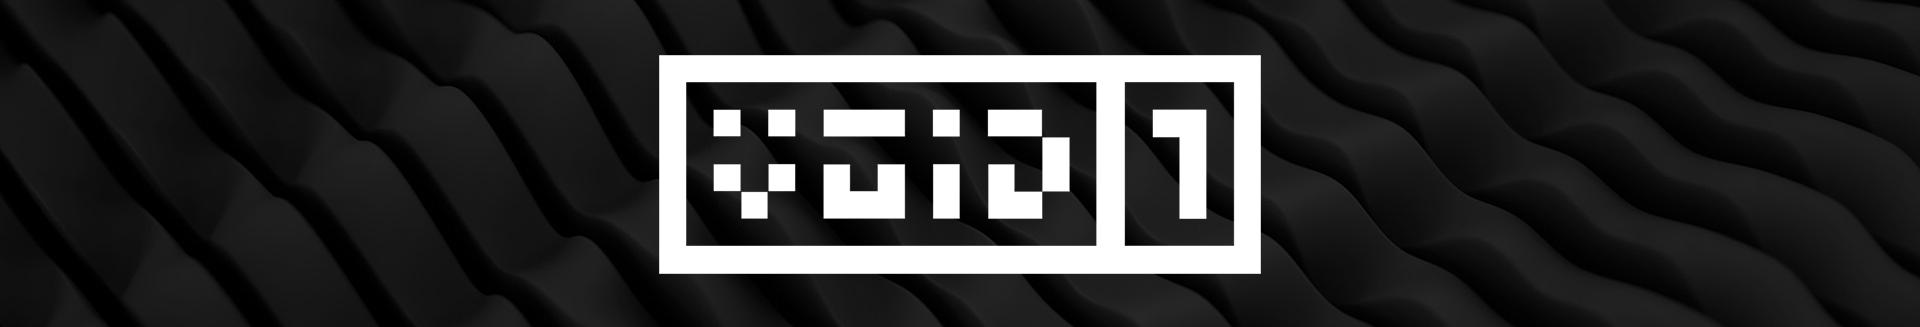 Free Hologram Shader for Unity URP